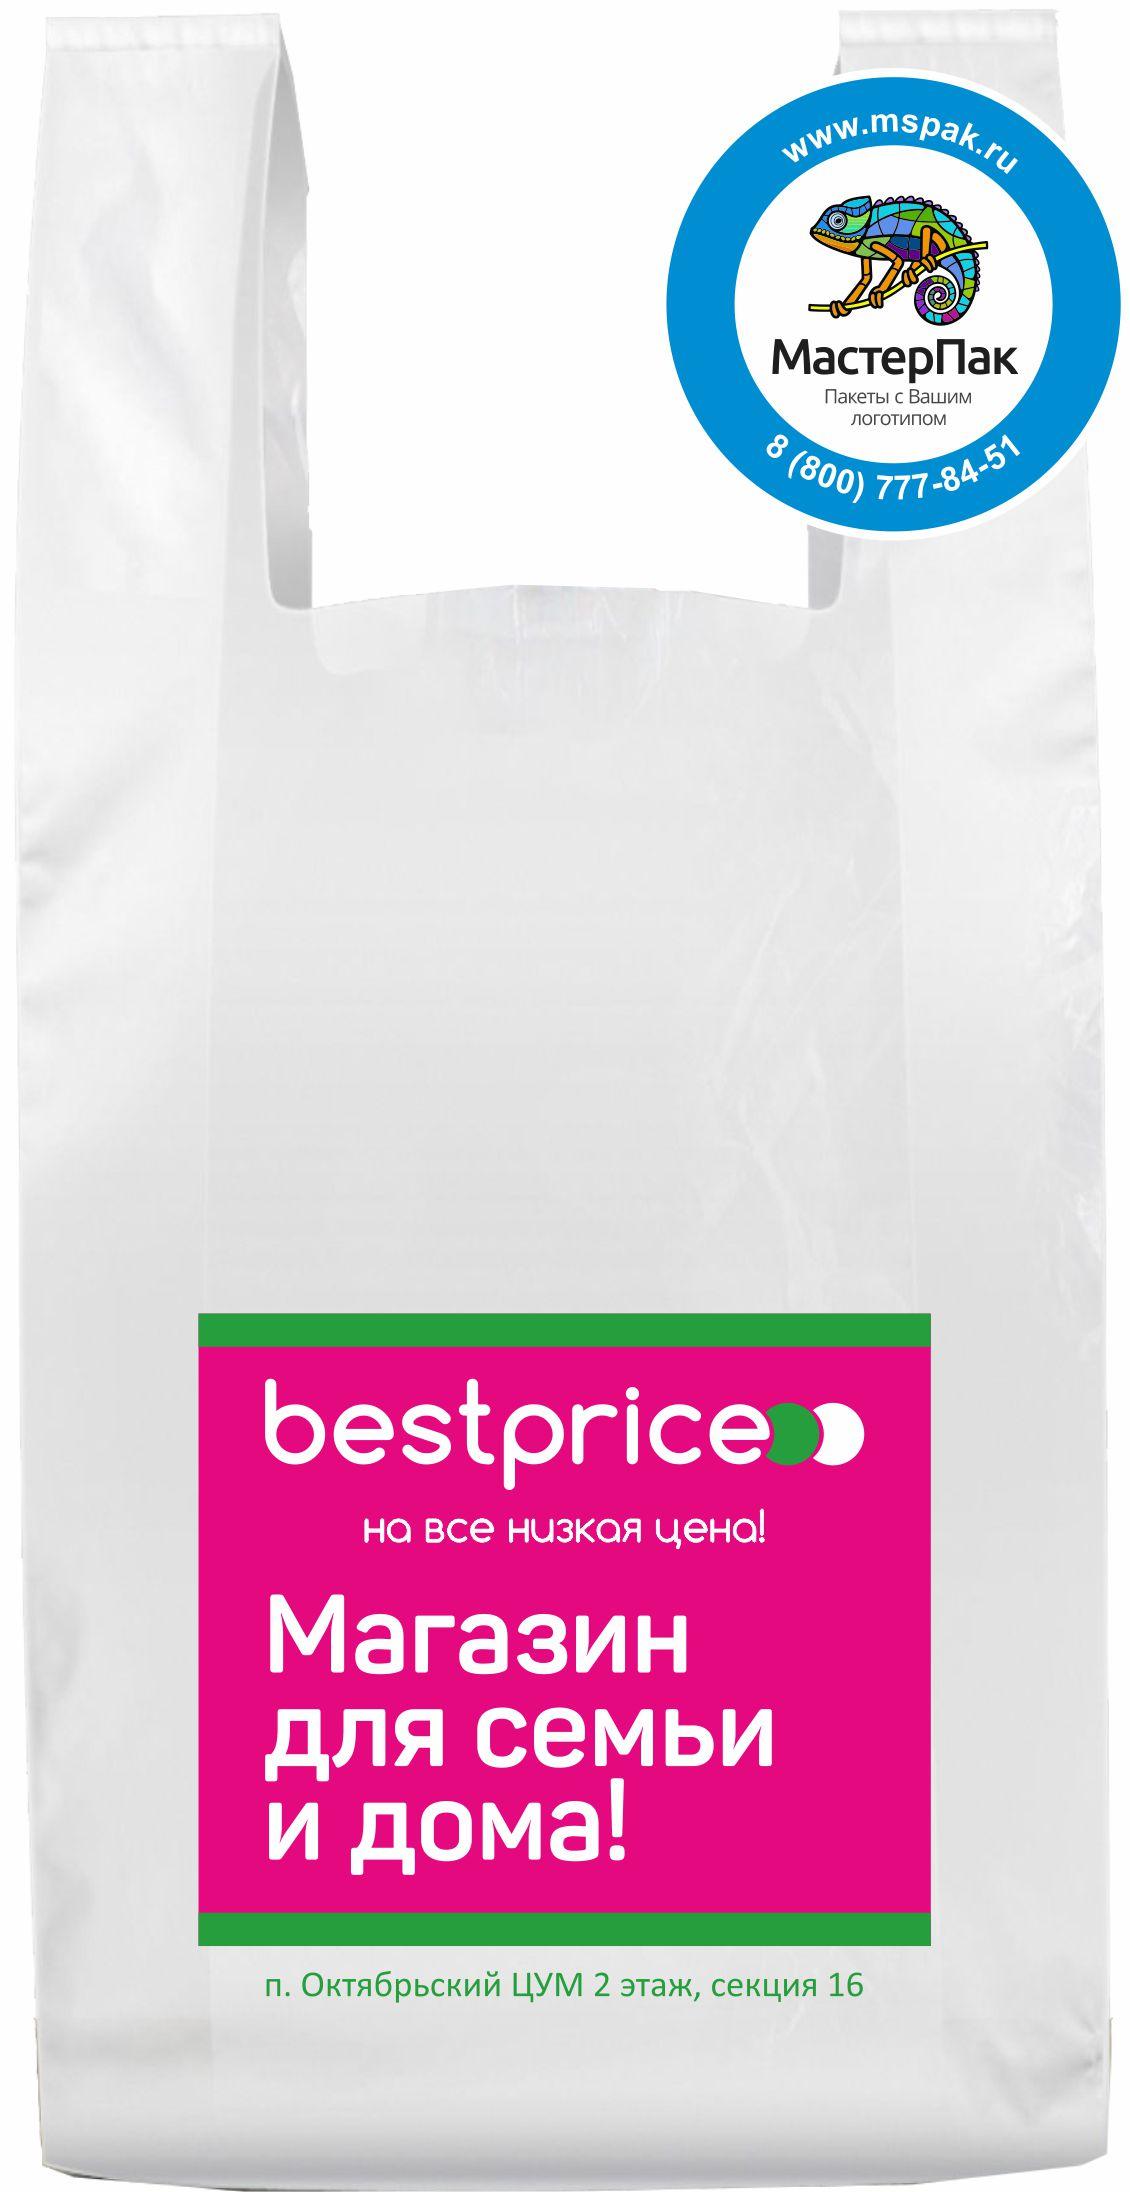 Пакет-майка ПНД с логотипом Bestprice (флексопечать)